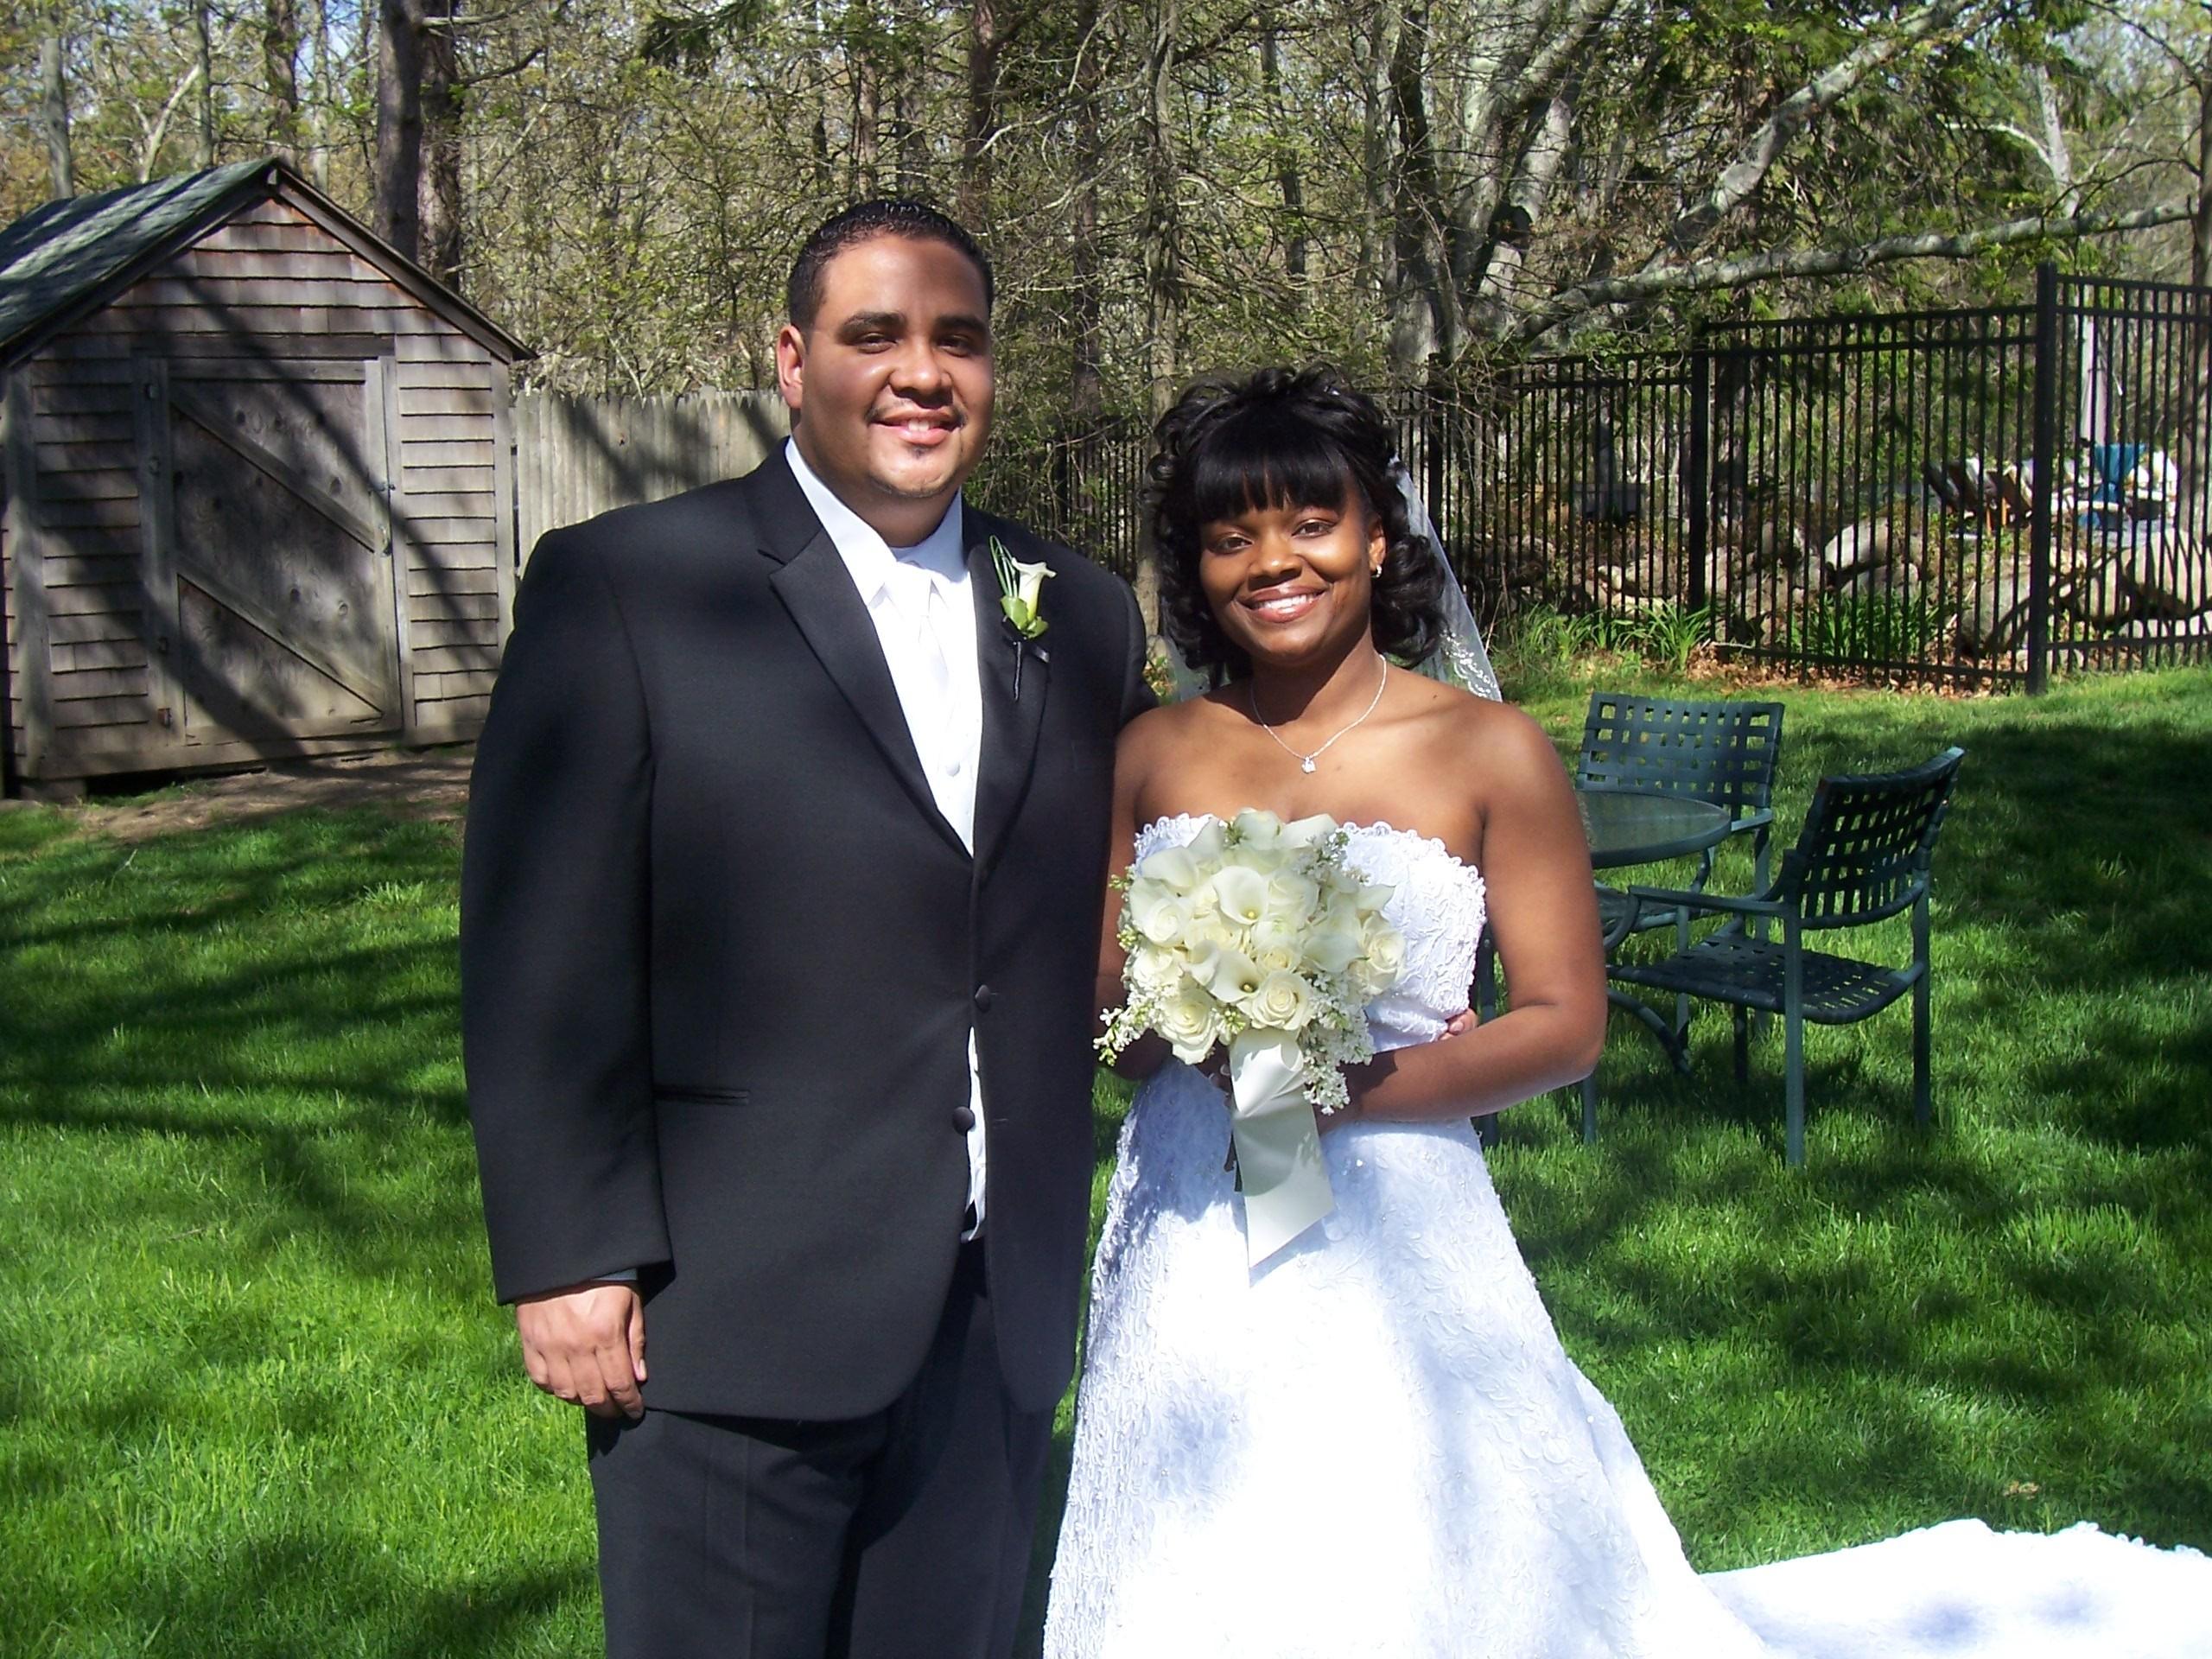 Flowers & Decor, Wedding Dresses, Fashion, dress, Men's Formal Wear, Bride Bouquets, Bride, Flowers, Groom, Wedding, Tux, Dj, Outside, Ramu the crew, Flower Wedding Dresses